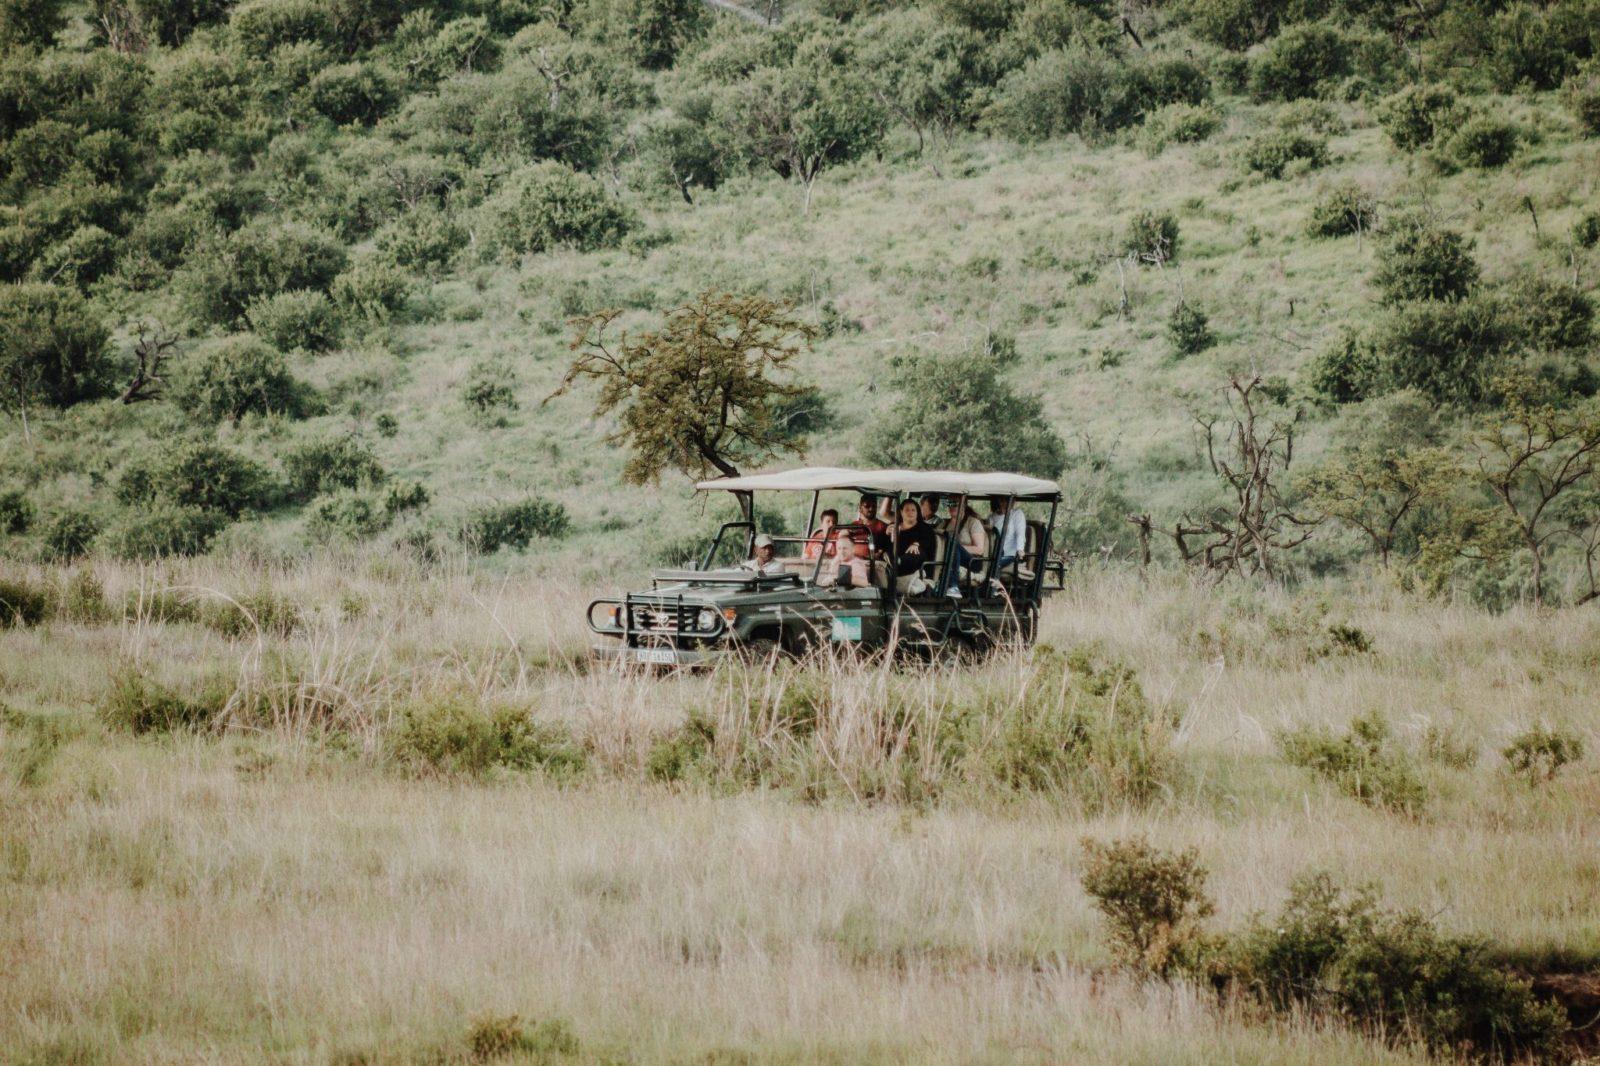 TRAVEL TIPS SAFARI TANZANIA